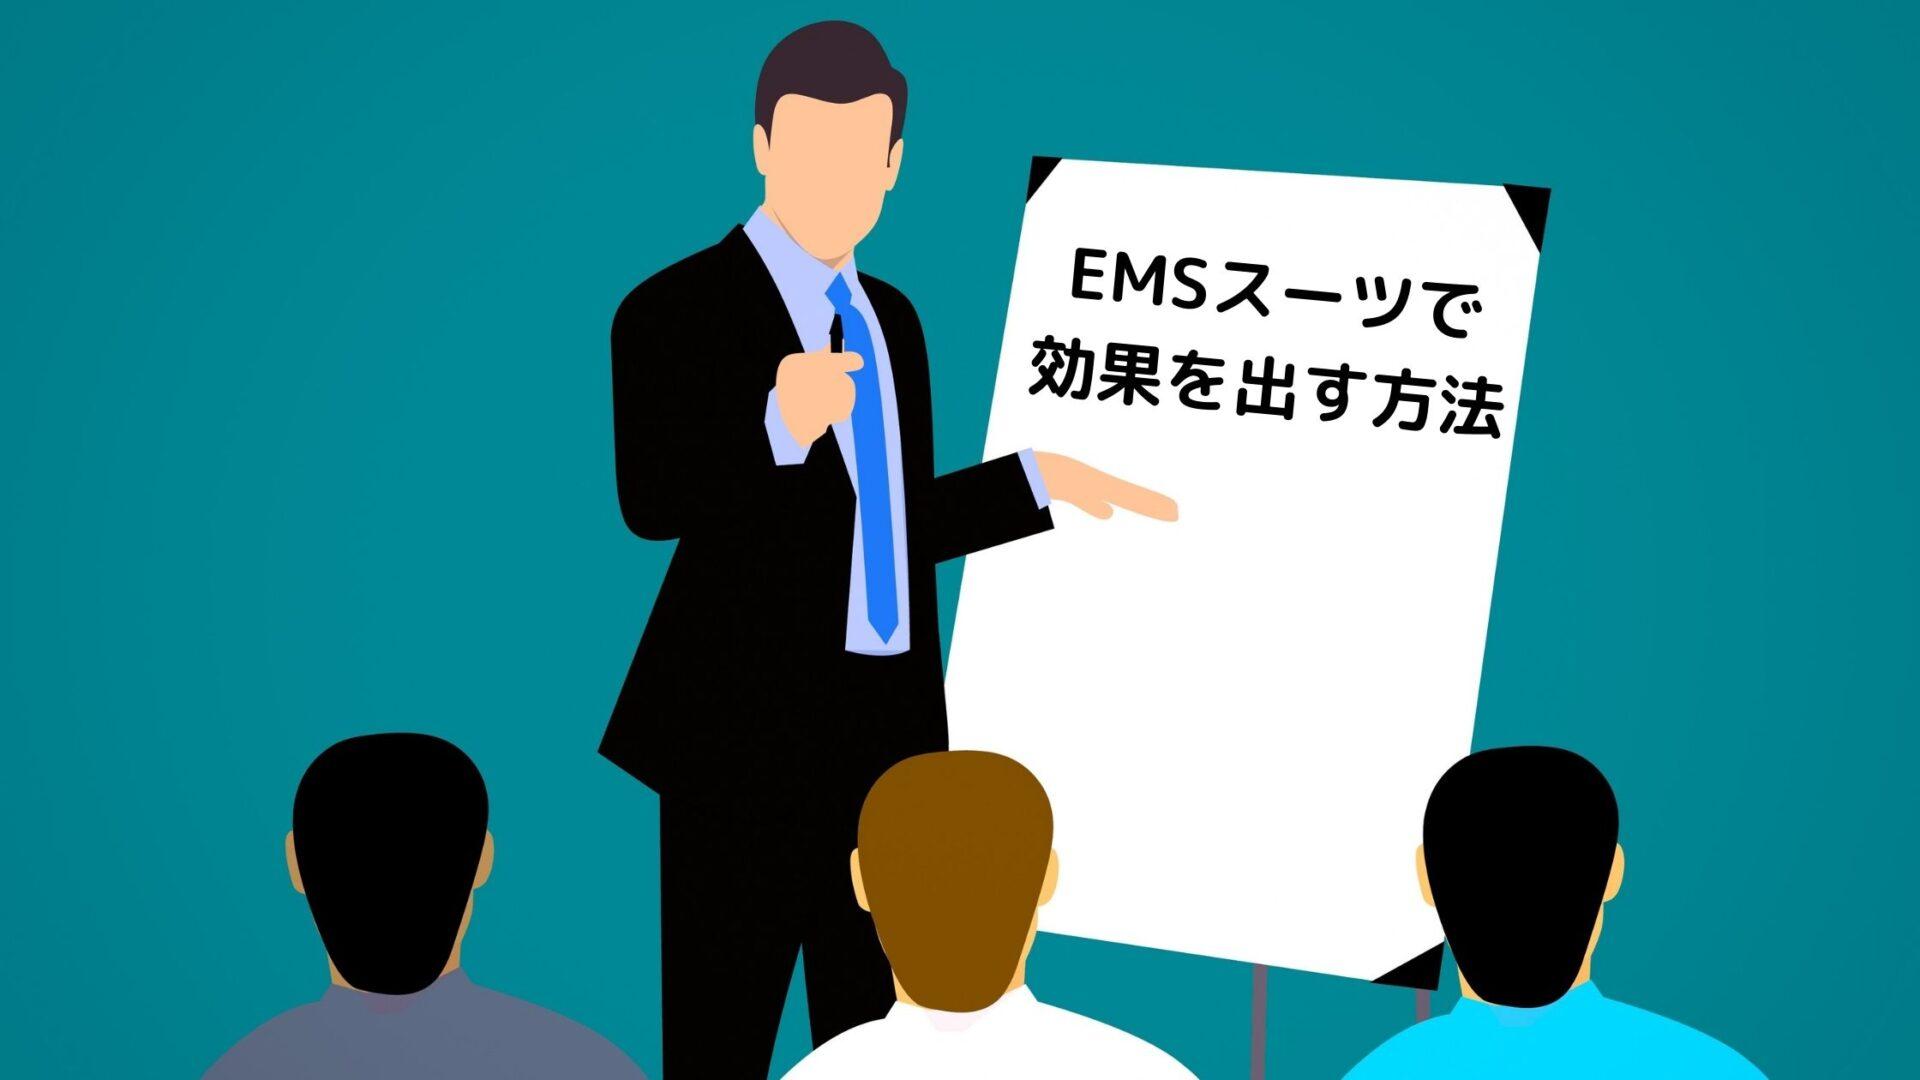 EMSスーツで効果を出すための方法